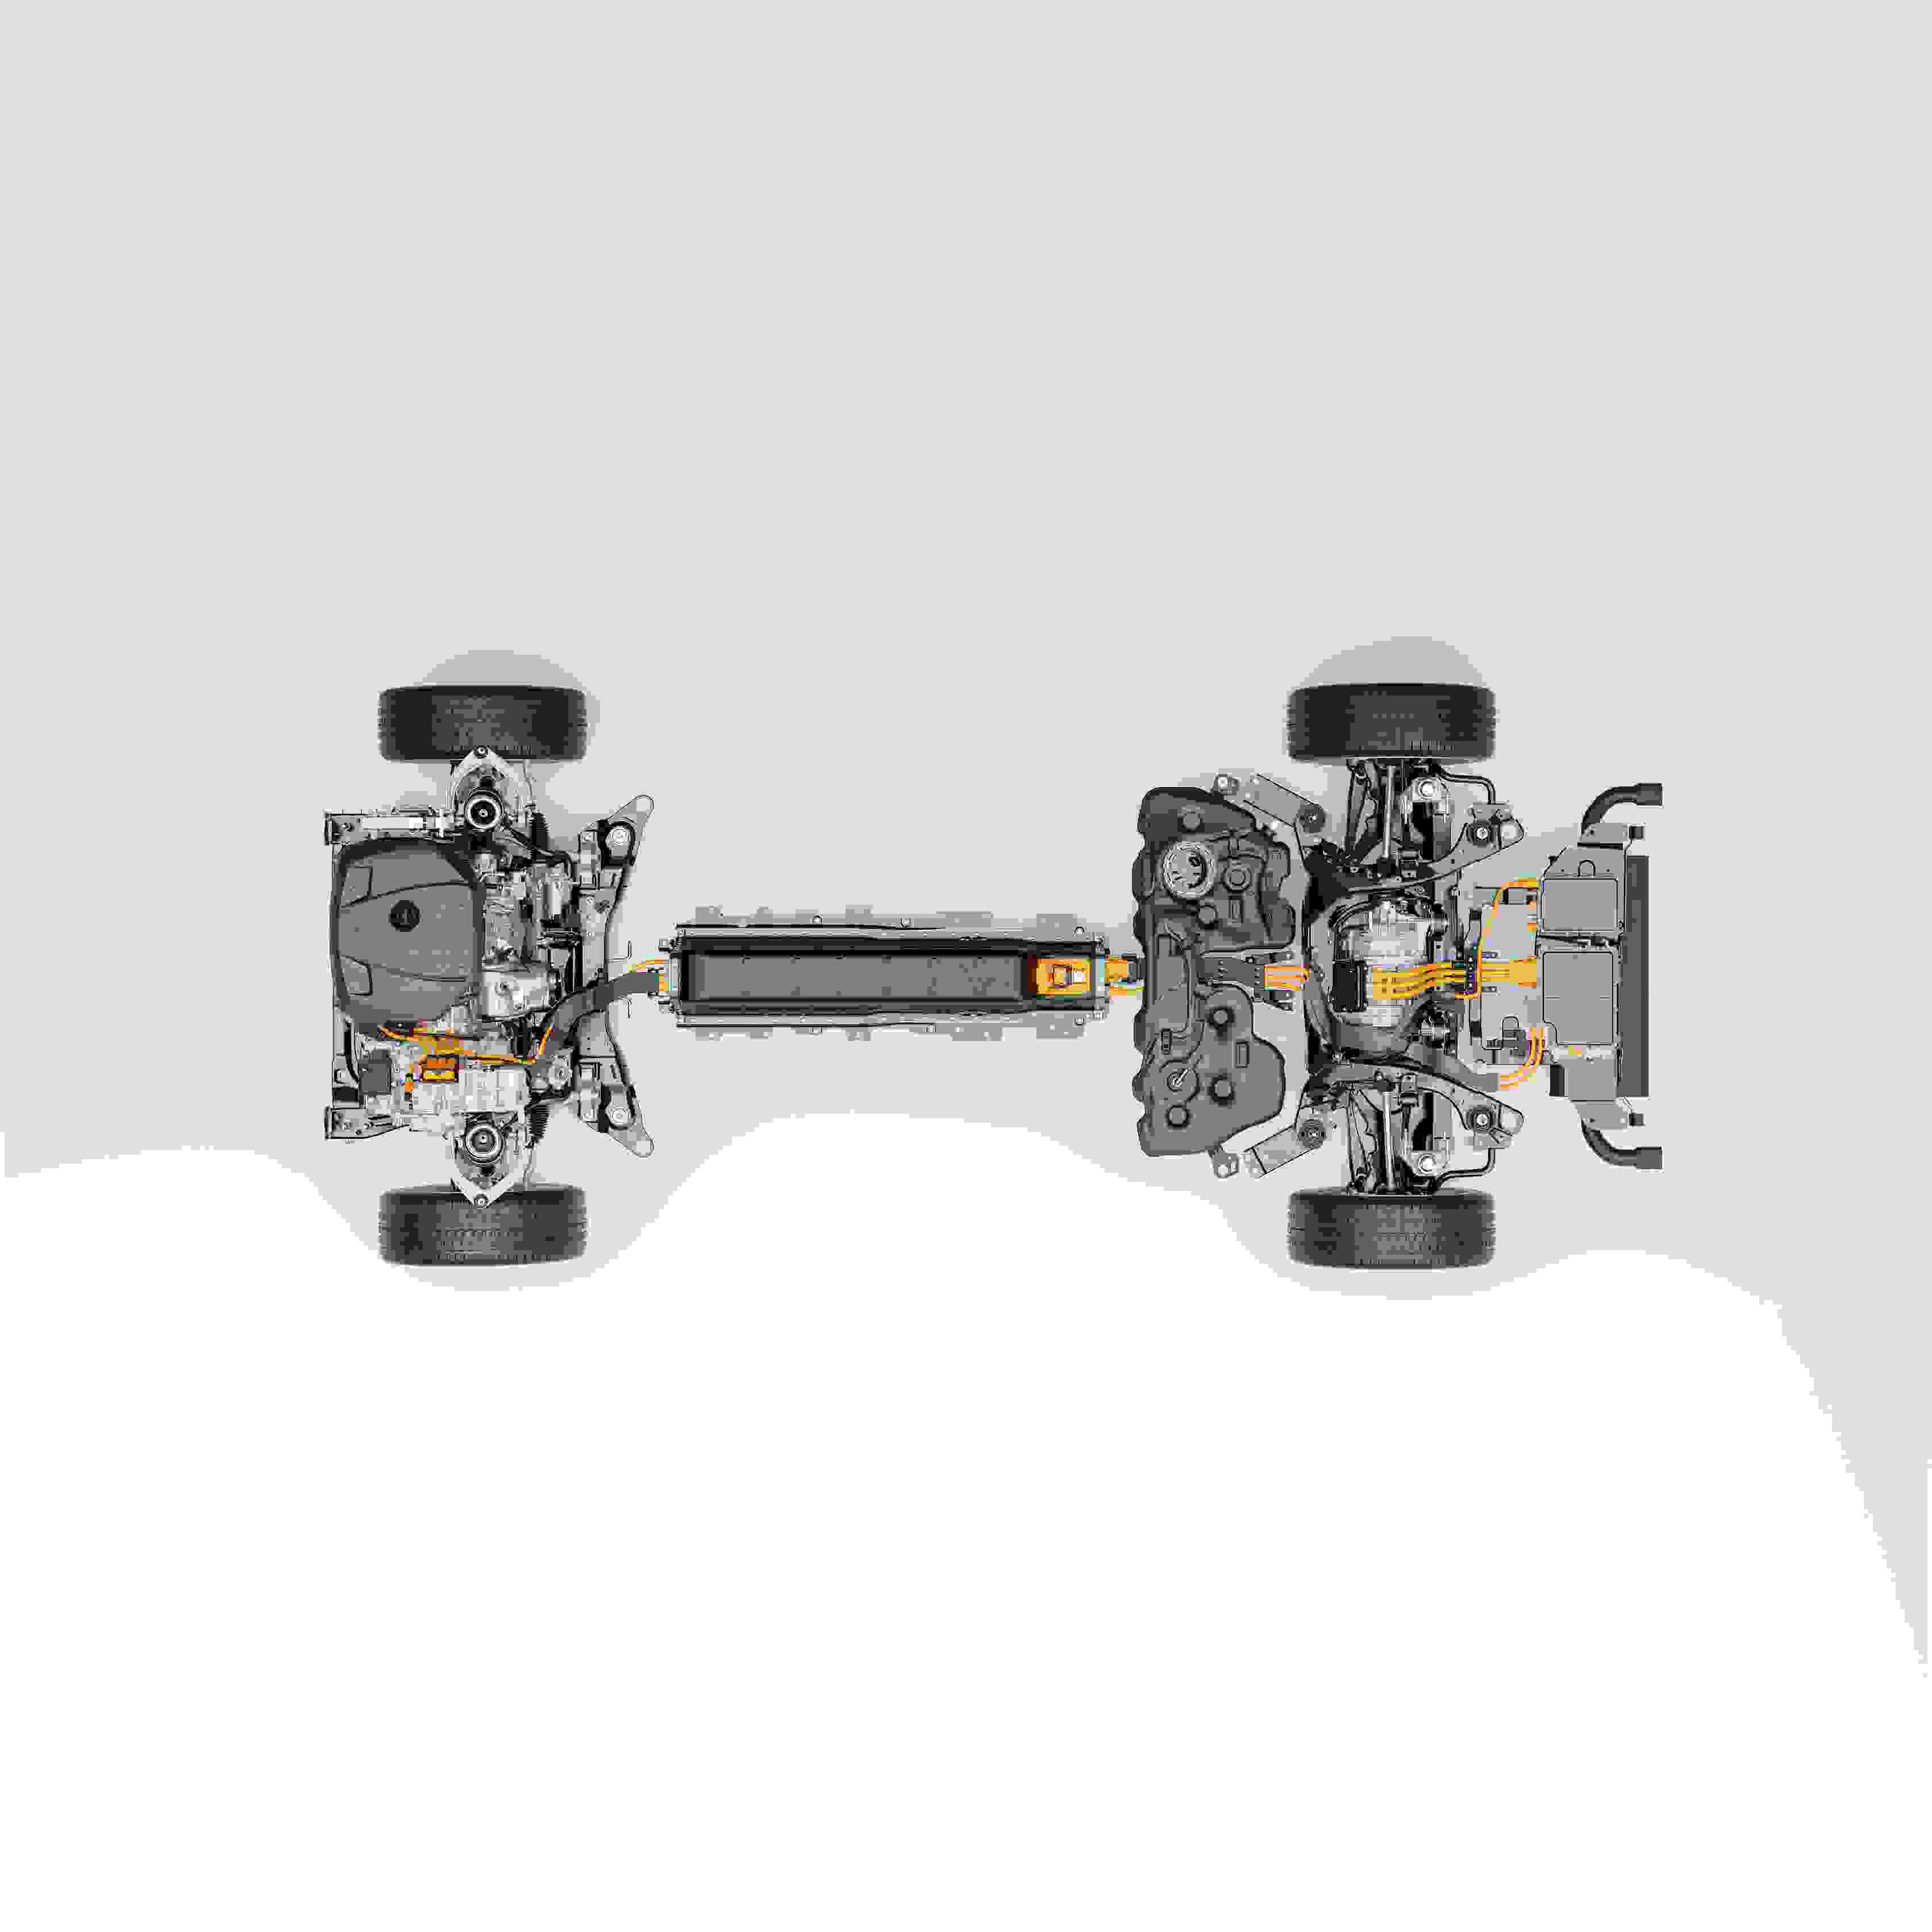 2049 Technical Cutaway Volvo Cars New Recharge Plug In Hybrid Powertrain